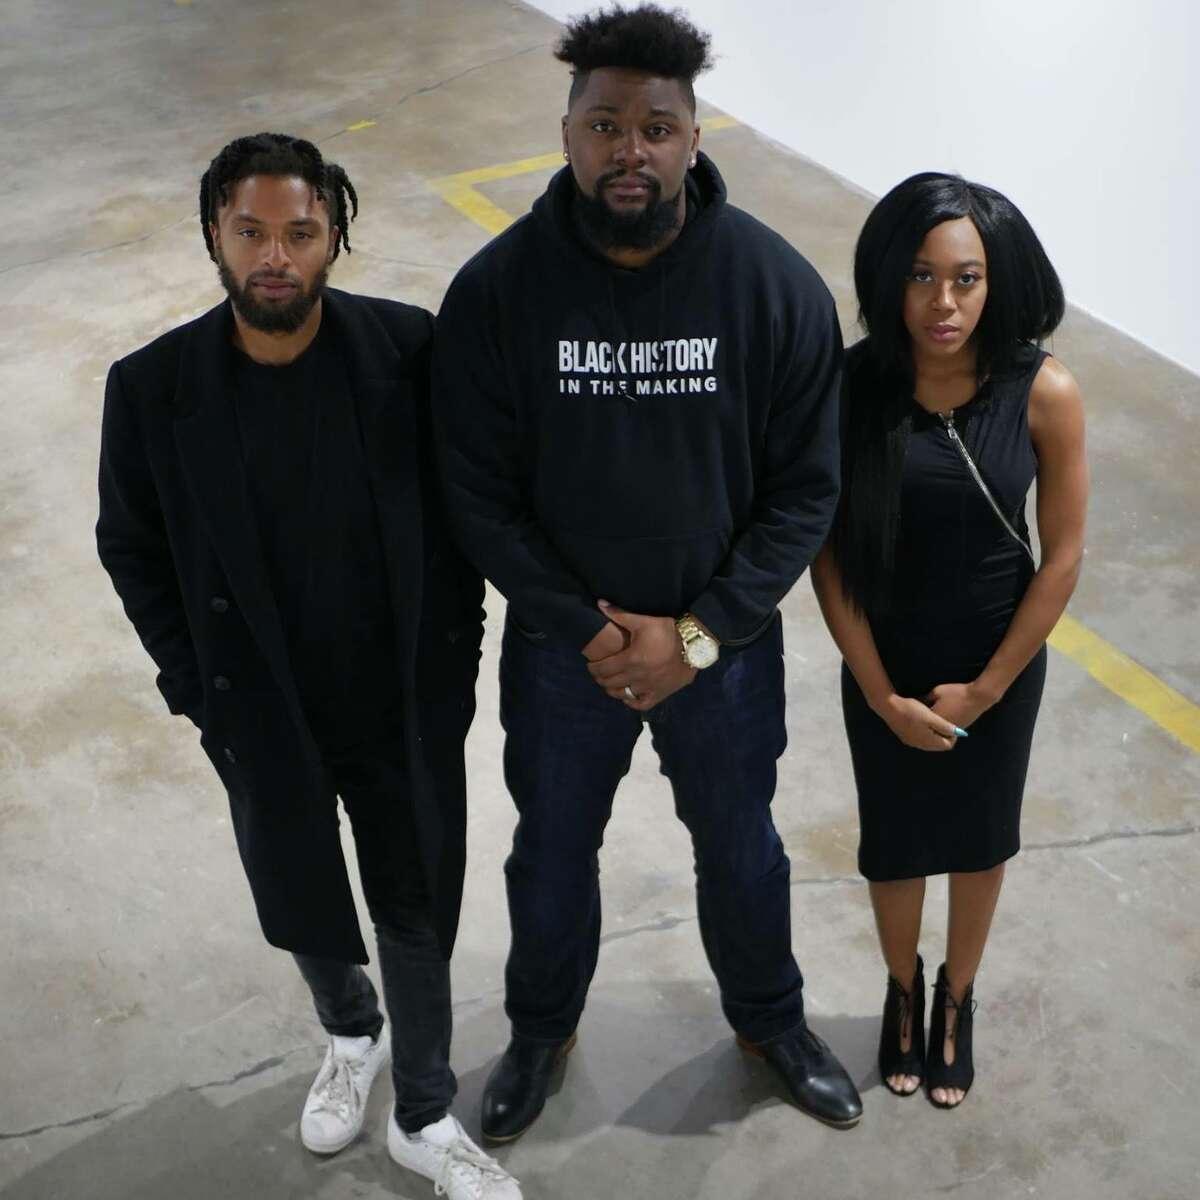 National Black Film Festival team includes (from left) Nate Edwards, J.O. Malone and Denisha Hardeman.